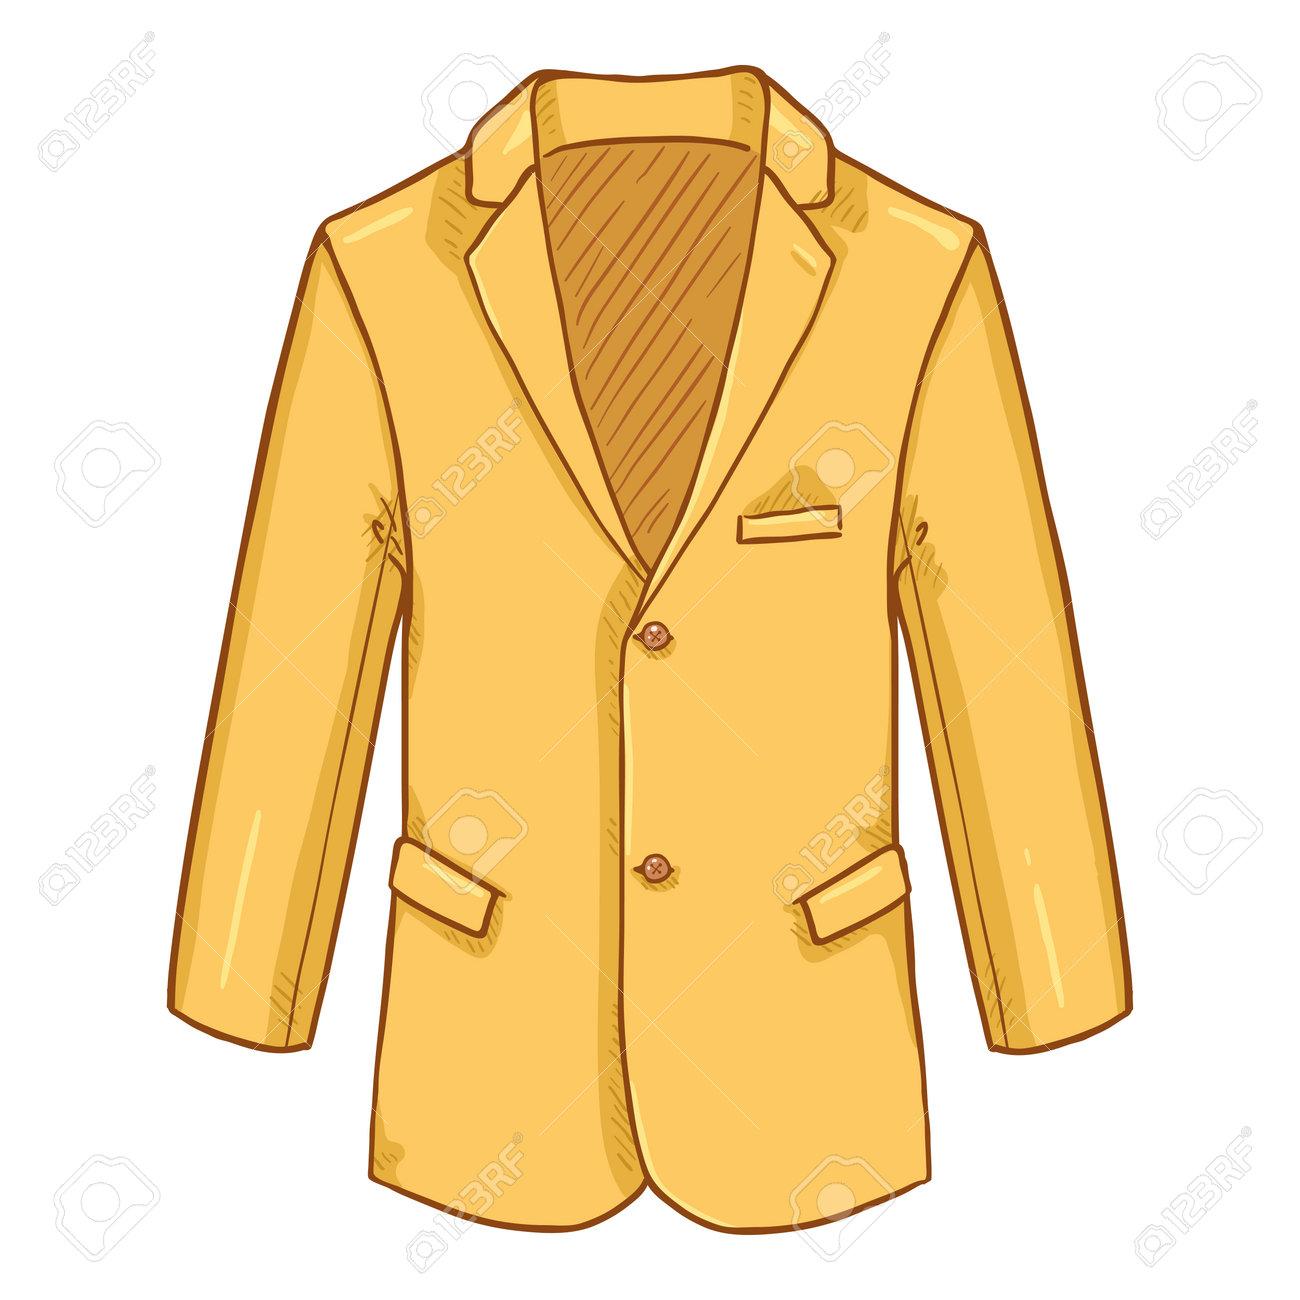 Yellow Blazer. Suit Jacket Vector Cartoon Illustration. - 169663655